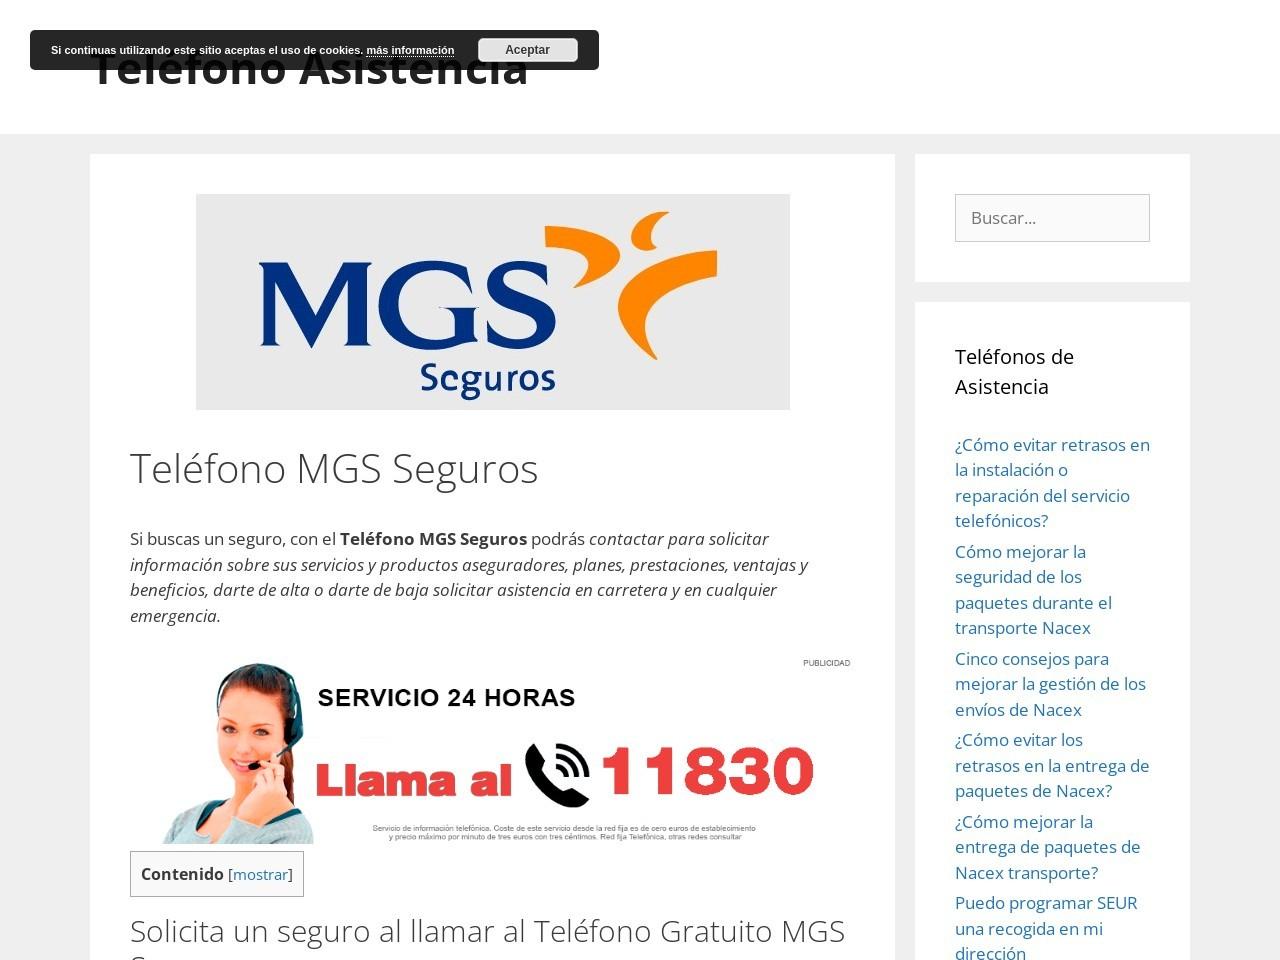 Mgs seguros telefono